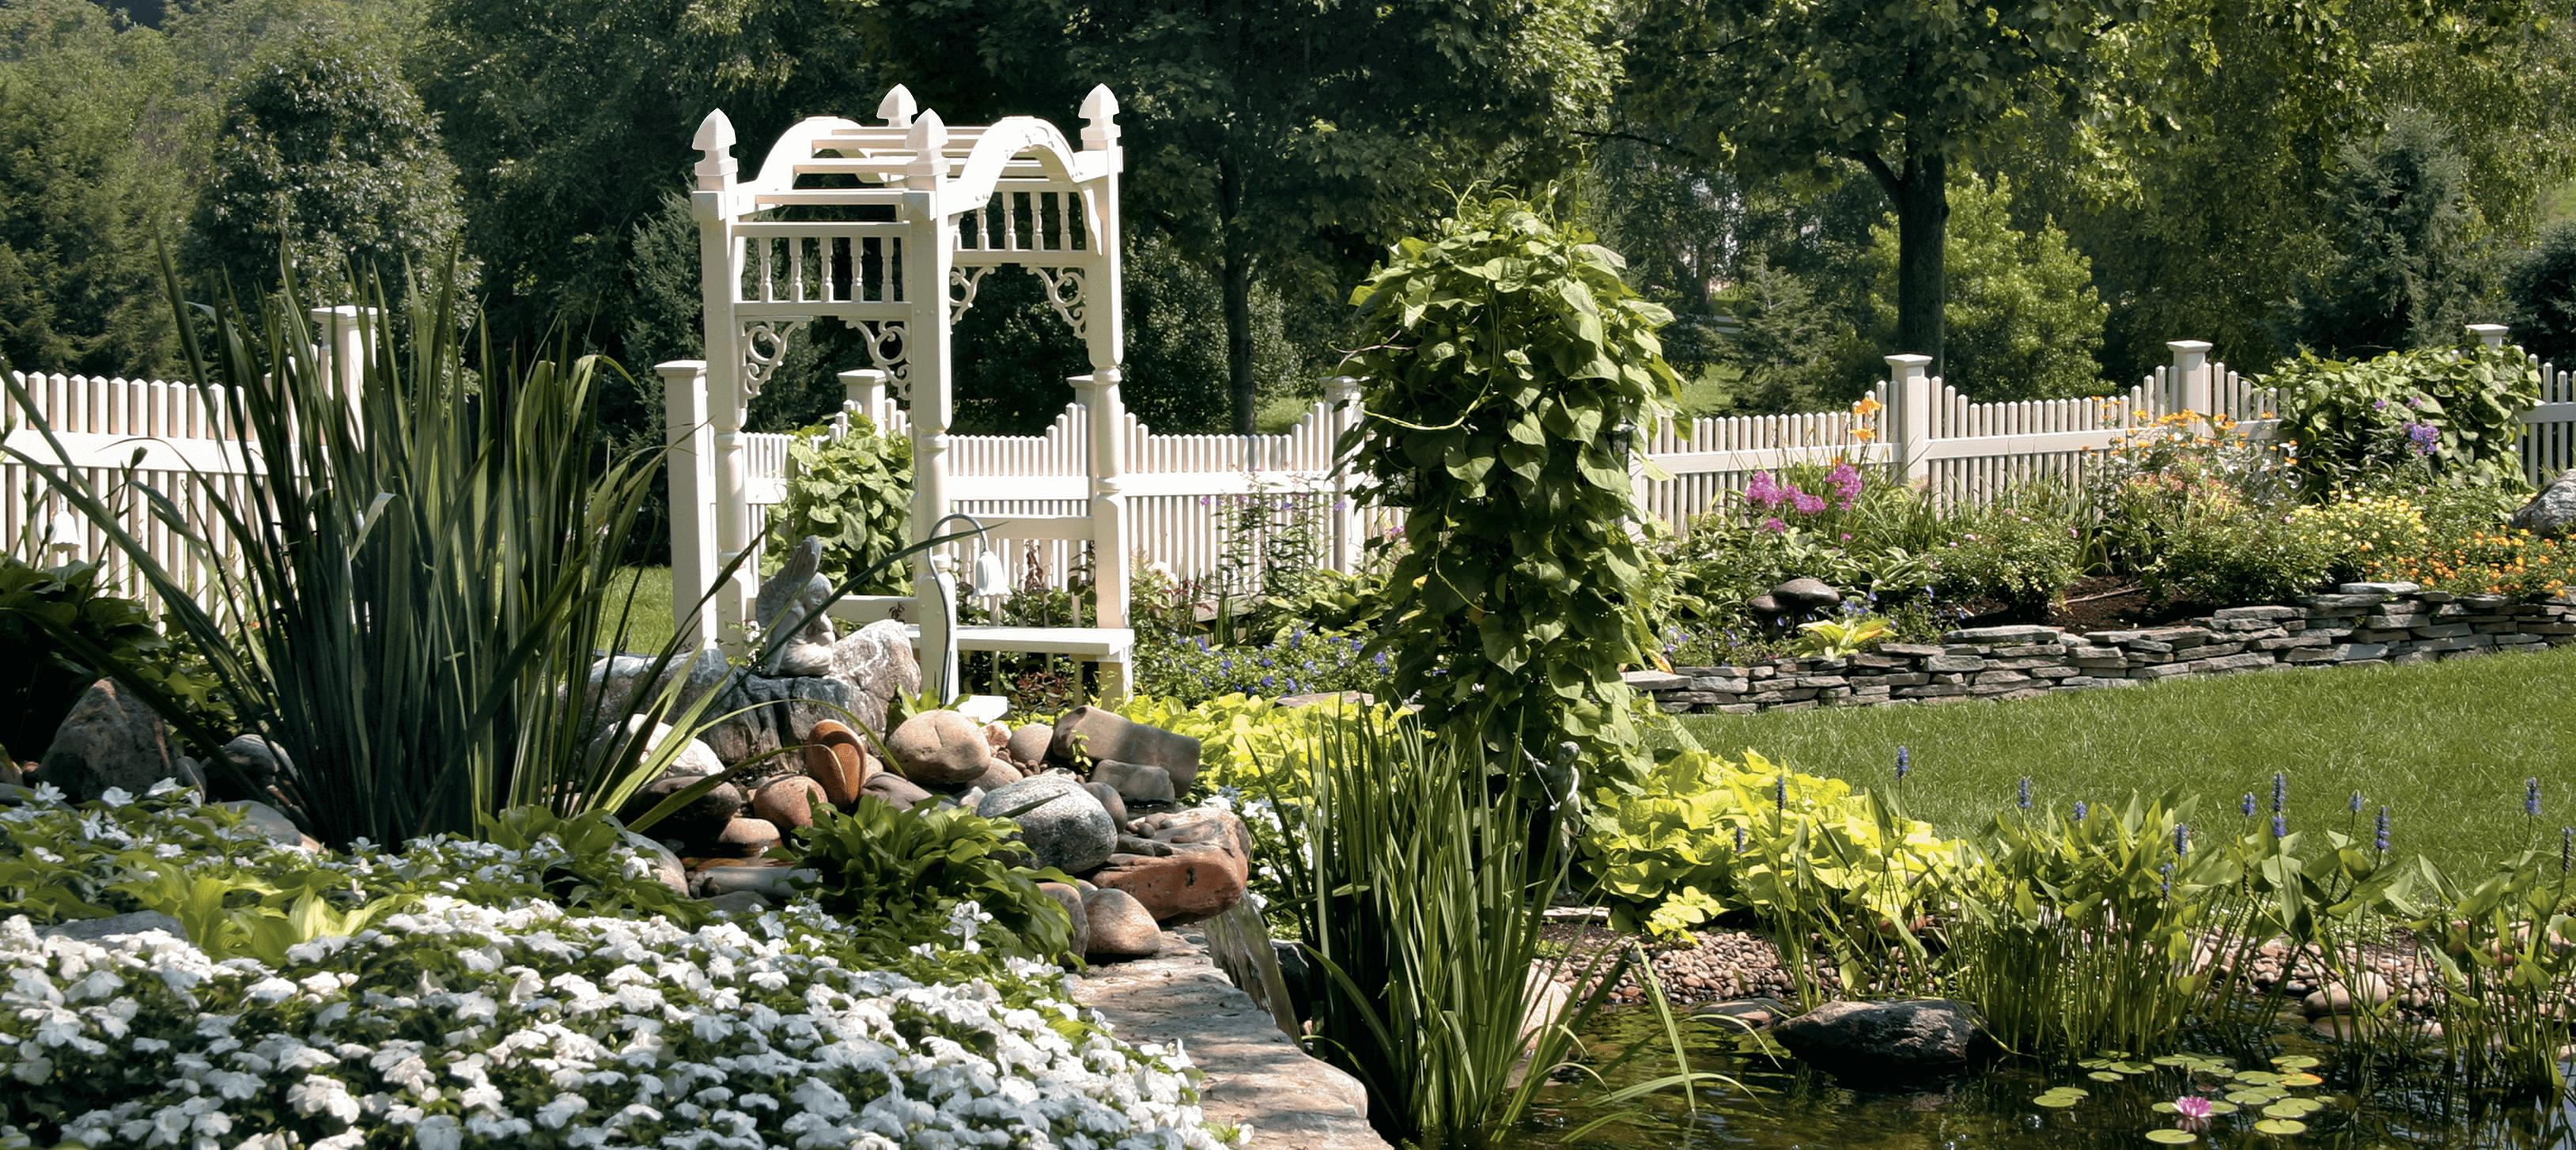 7 Ways to Create an At-Home Garden Getaway